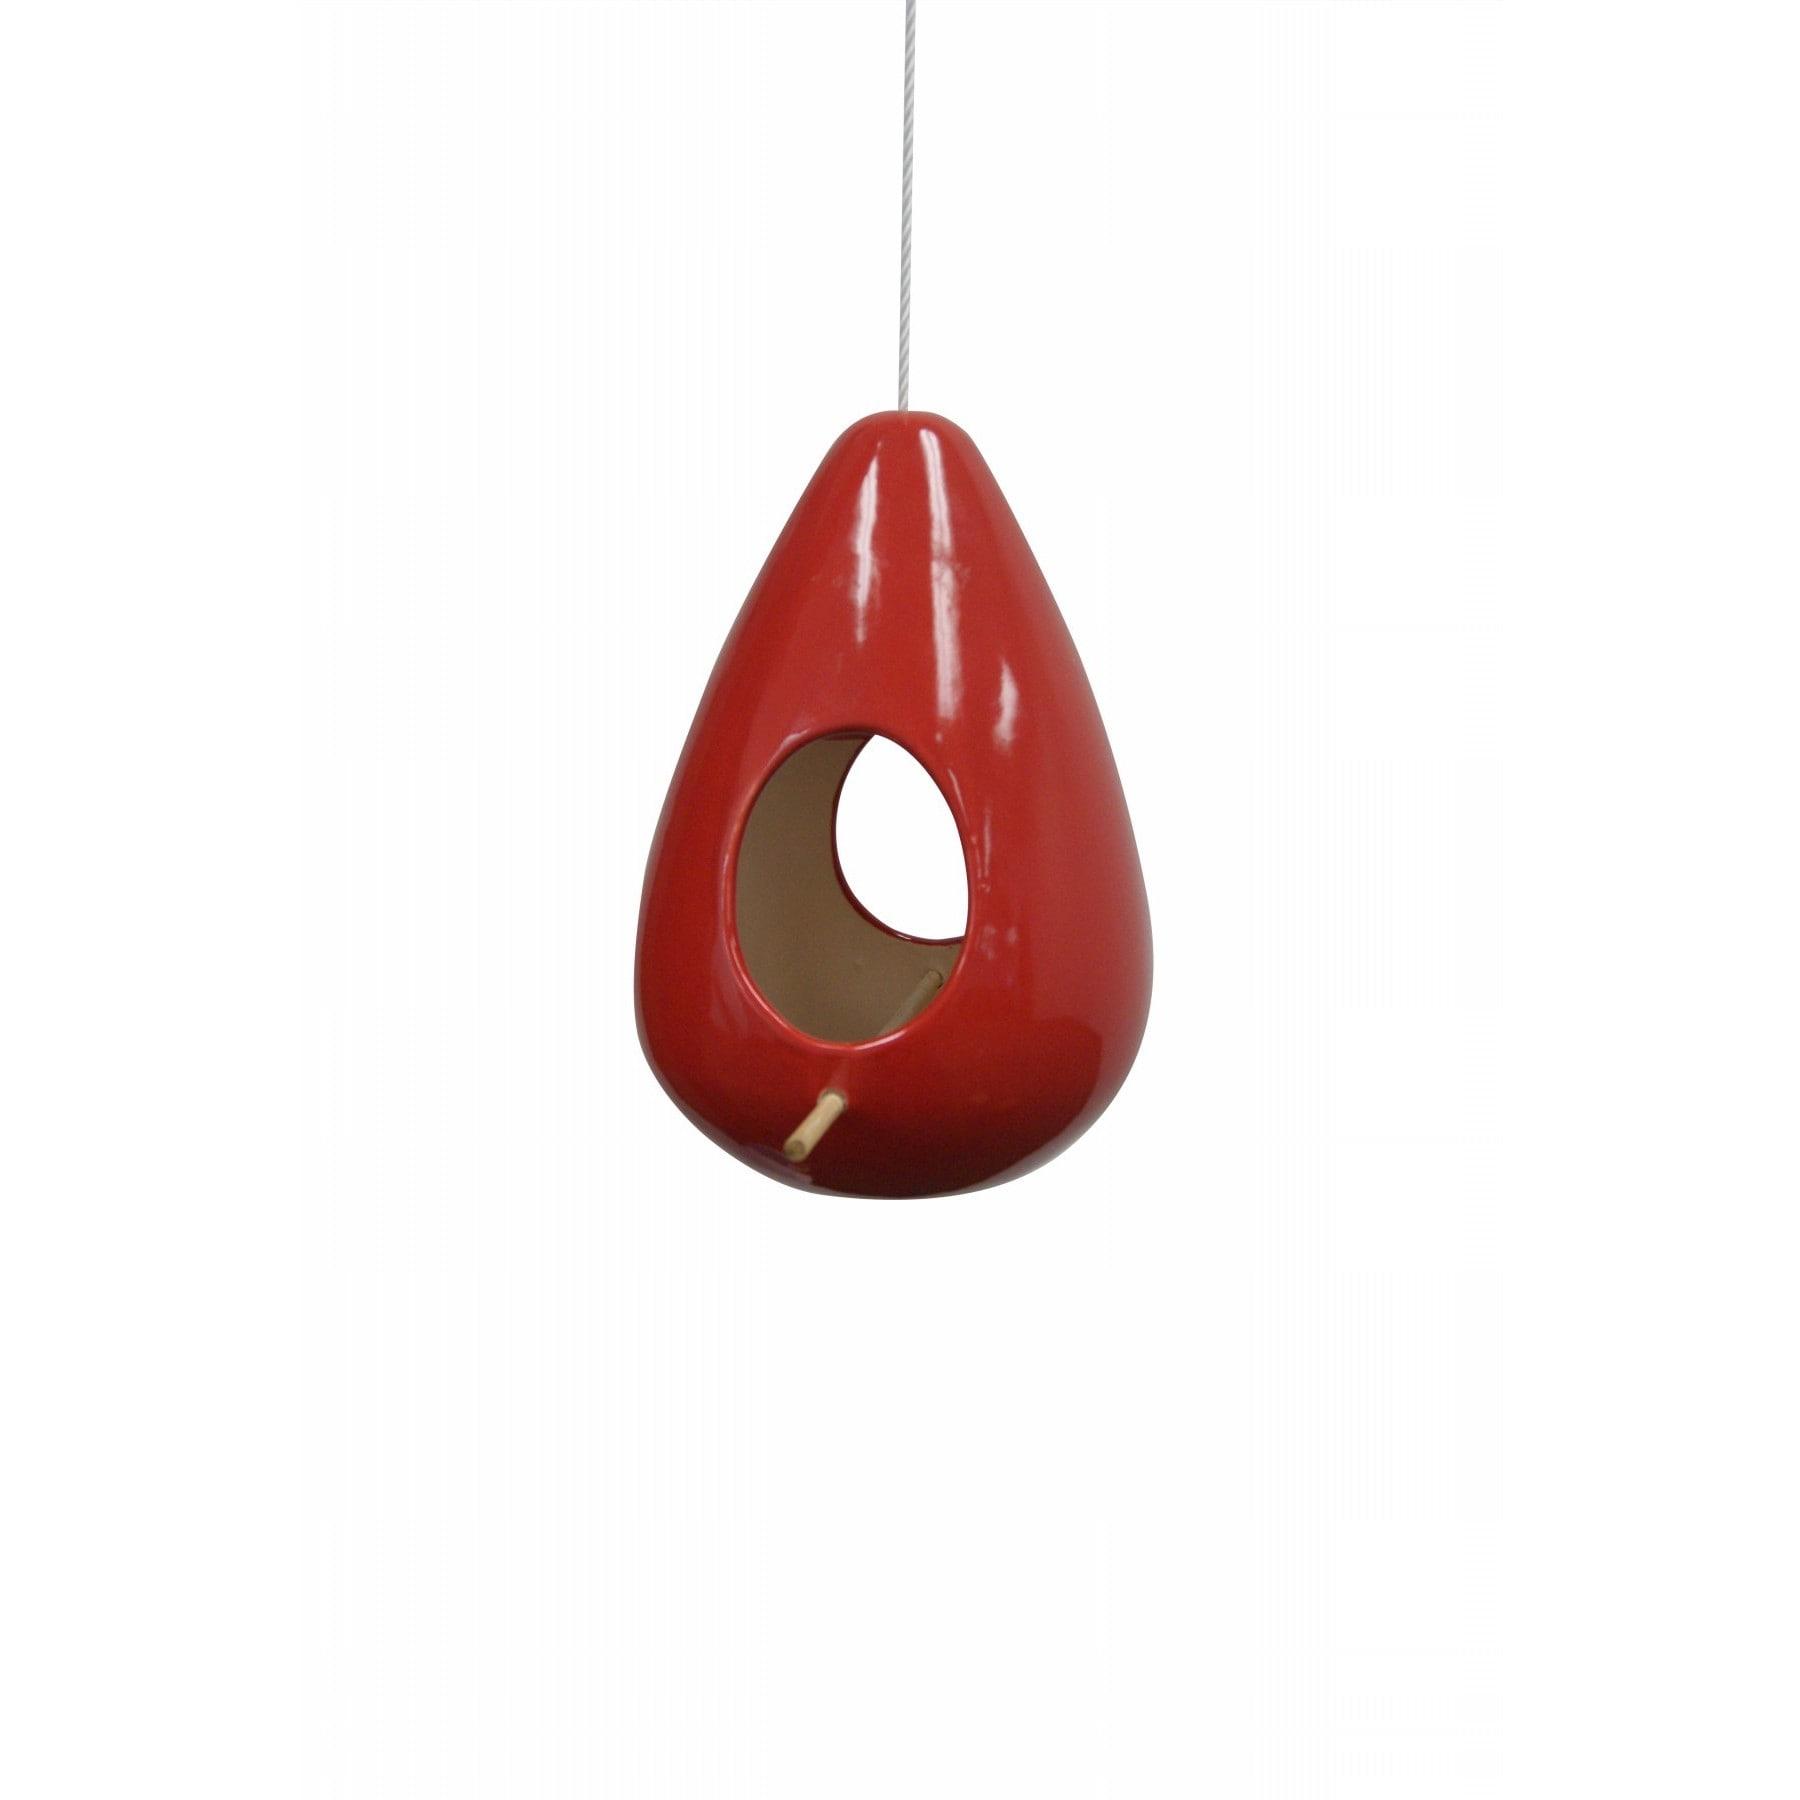 Alpine 10-inch Hanging Red Teardrop Shape Birdhouse (Red)...